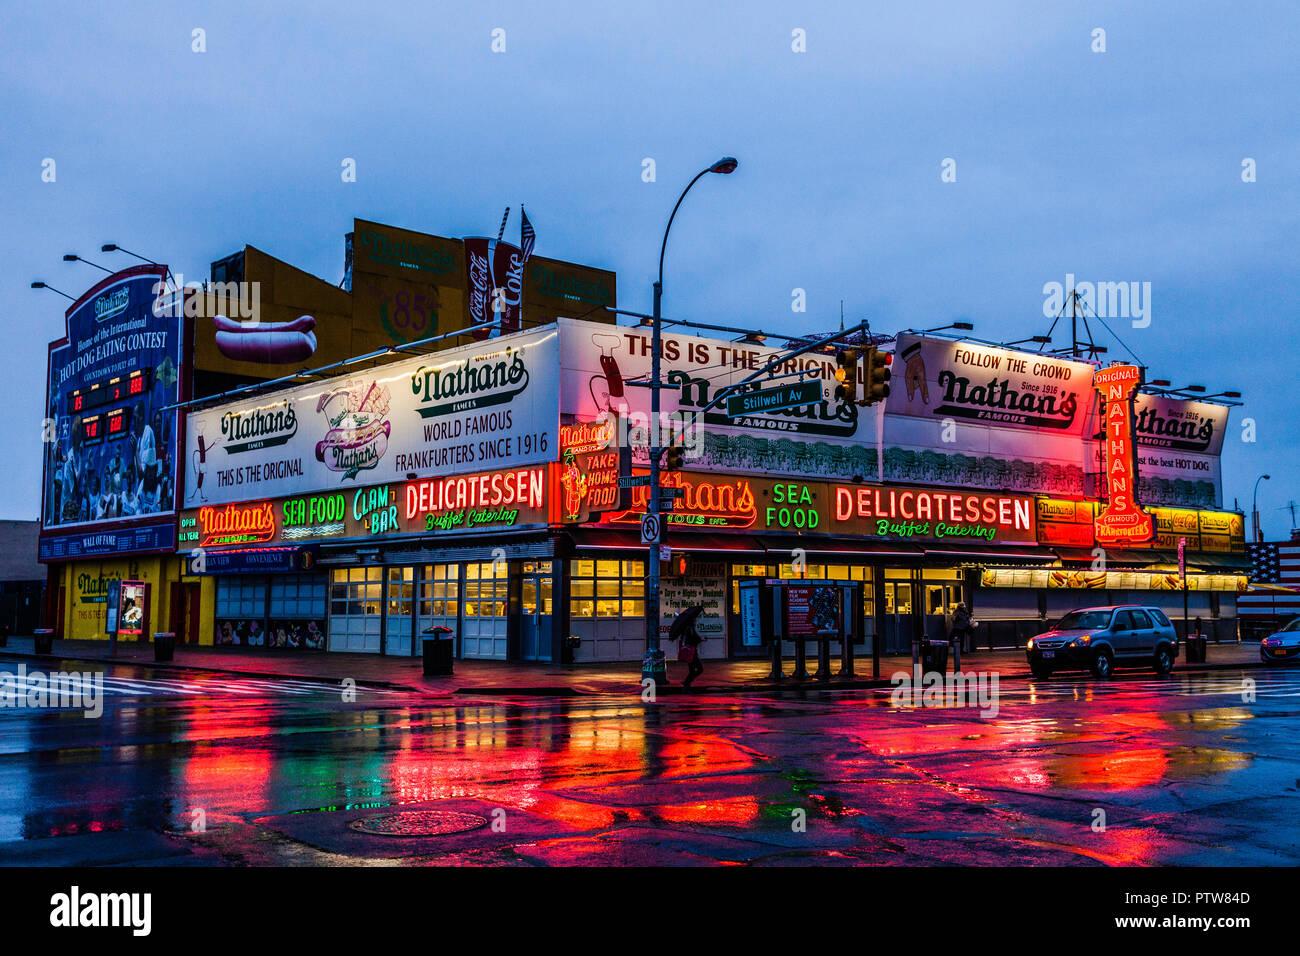 Coney Island Colliseum